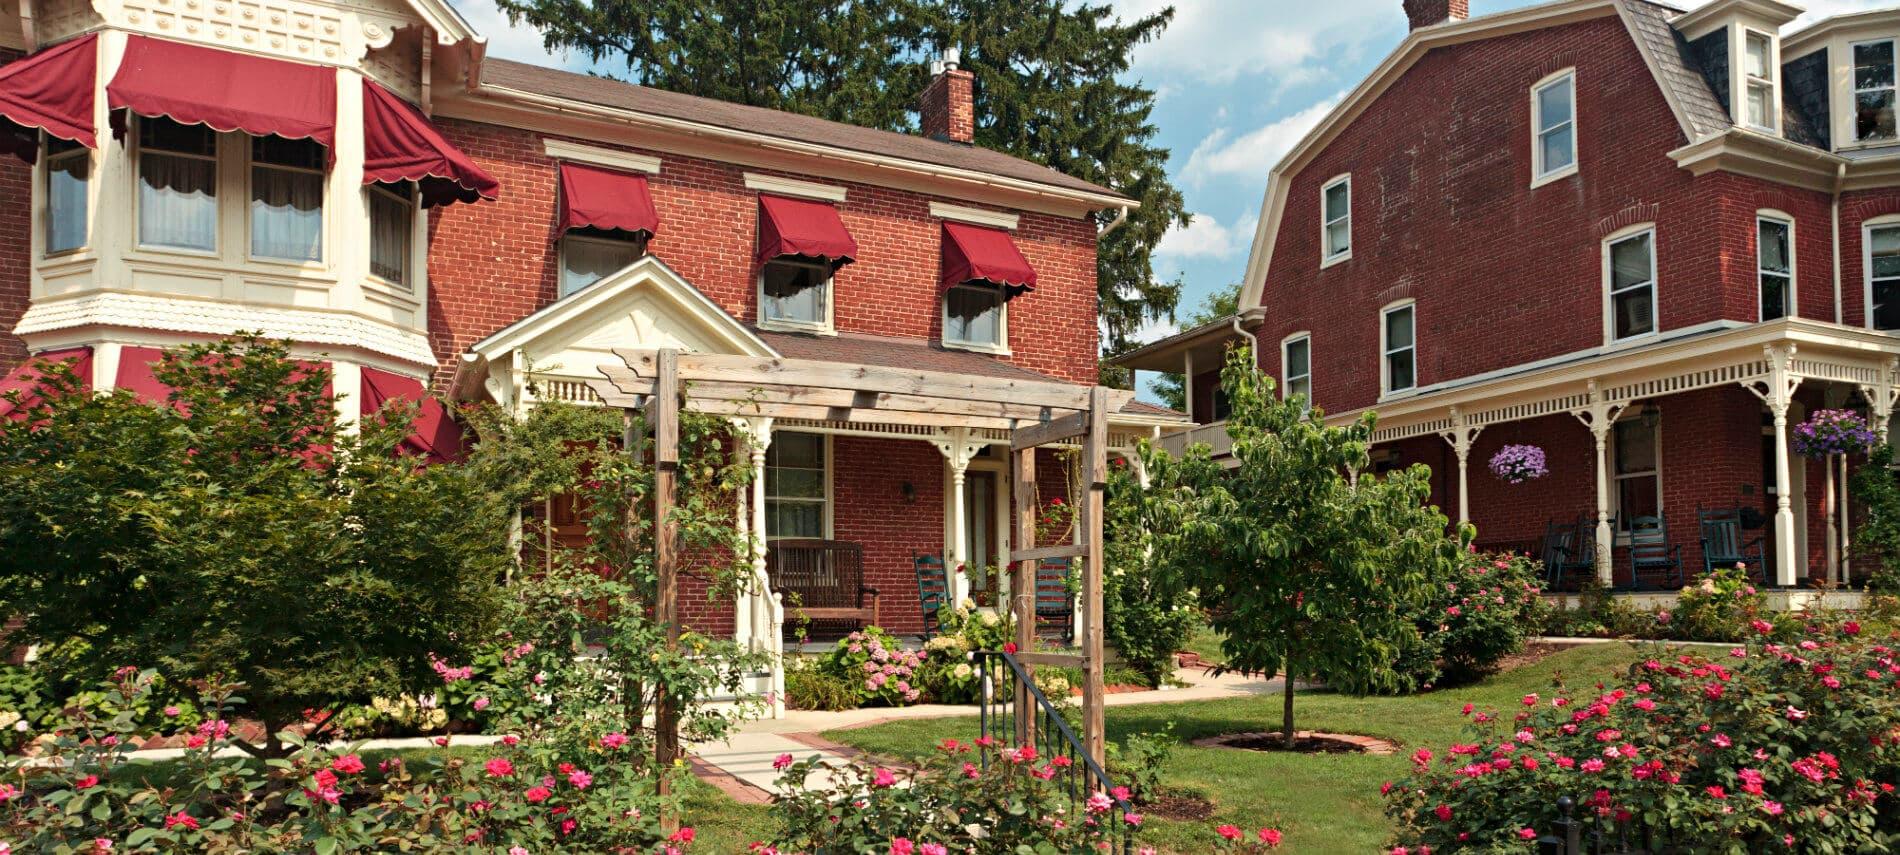 Brickhouse Inn: Bed and Breakfast in Downtown Gettysburg Pennsylvania PA